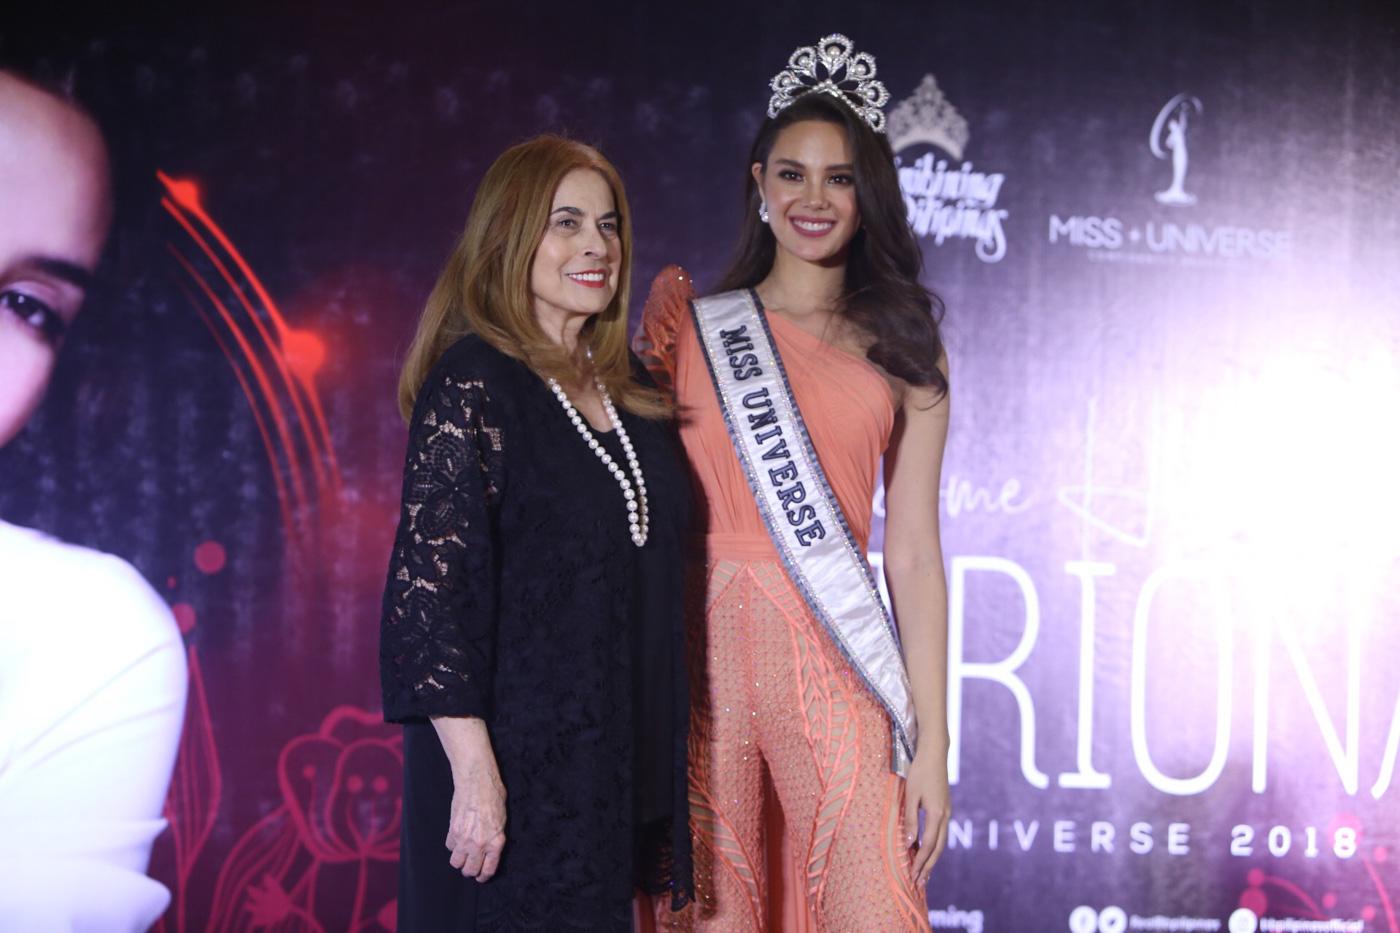 MISS UNIVERSE PHILIPPINES FRANCHISE. Paula Shugart confirms that Stella Araneta still holds the franchise of Miss Universe in the Philippines. File photo by Jory Rivera/Rappler